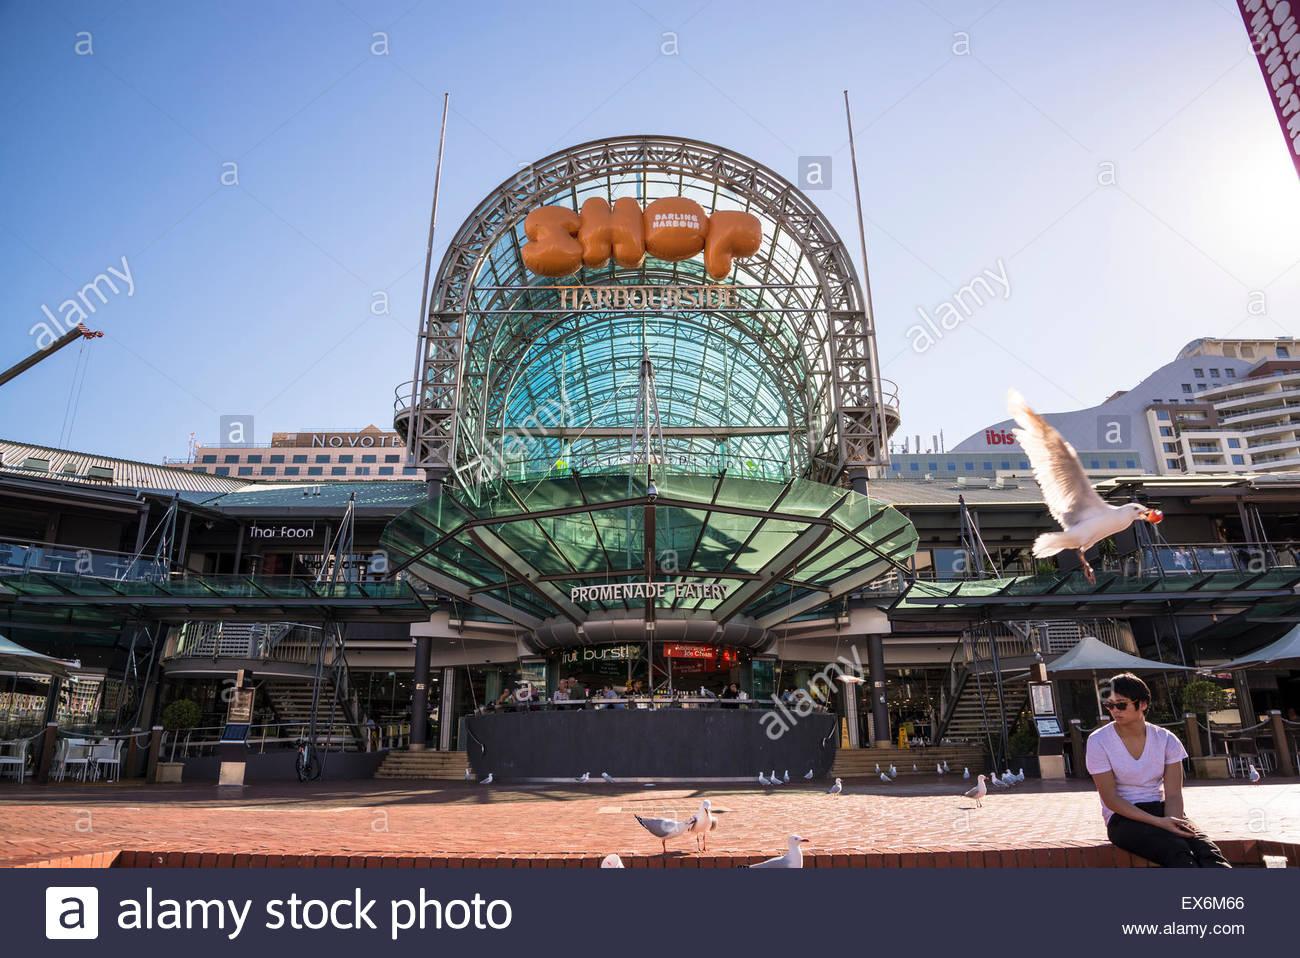 Harbourside Shopping Centre, Darling Harbour, Sydney, Australia - Stock Image